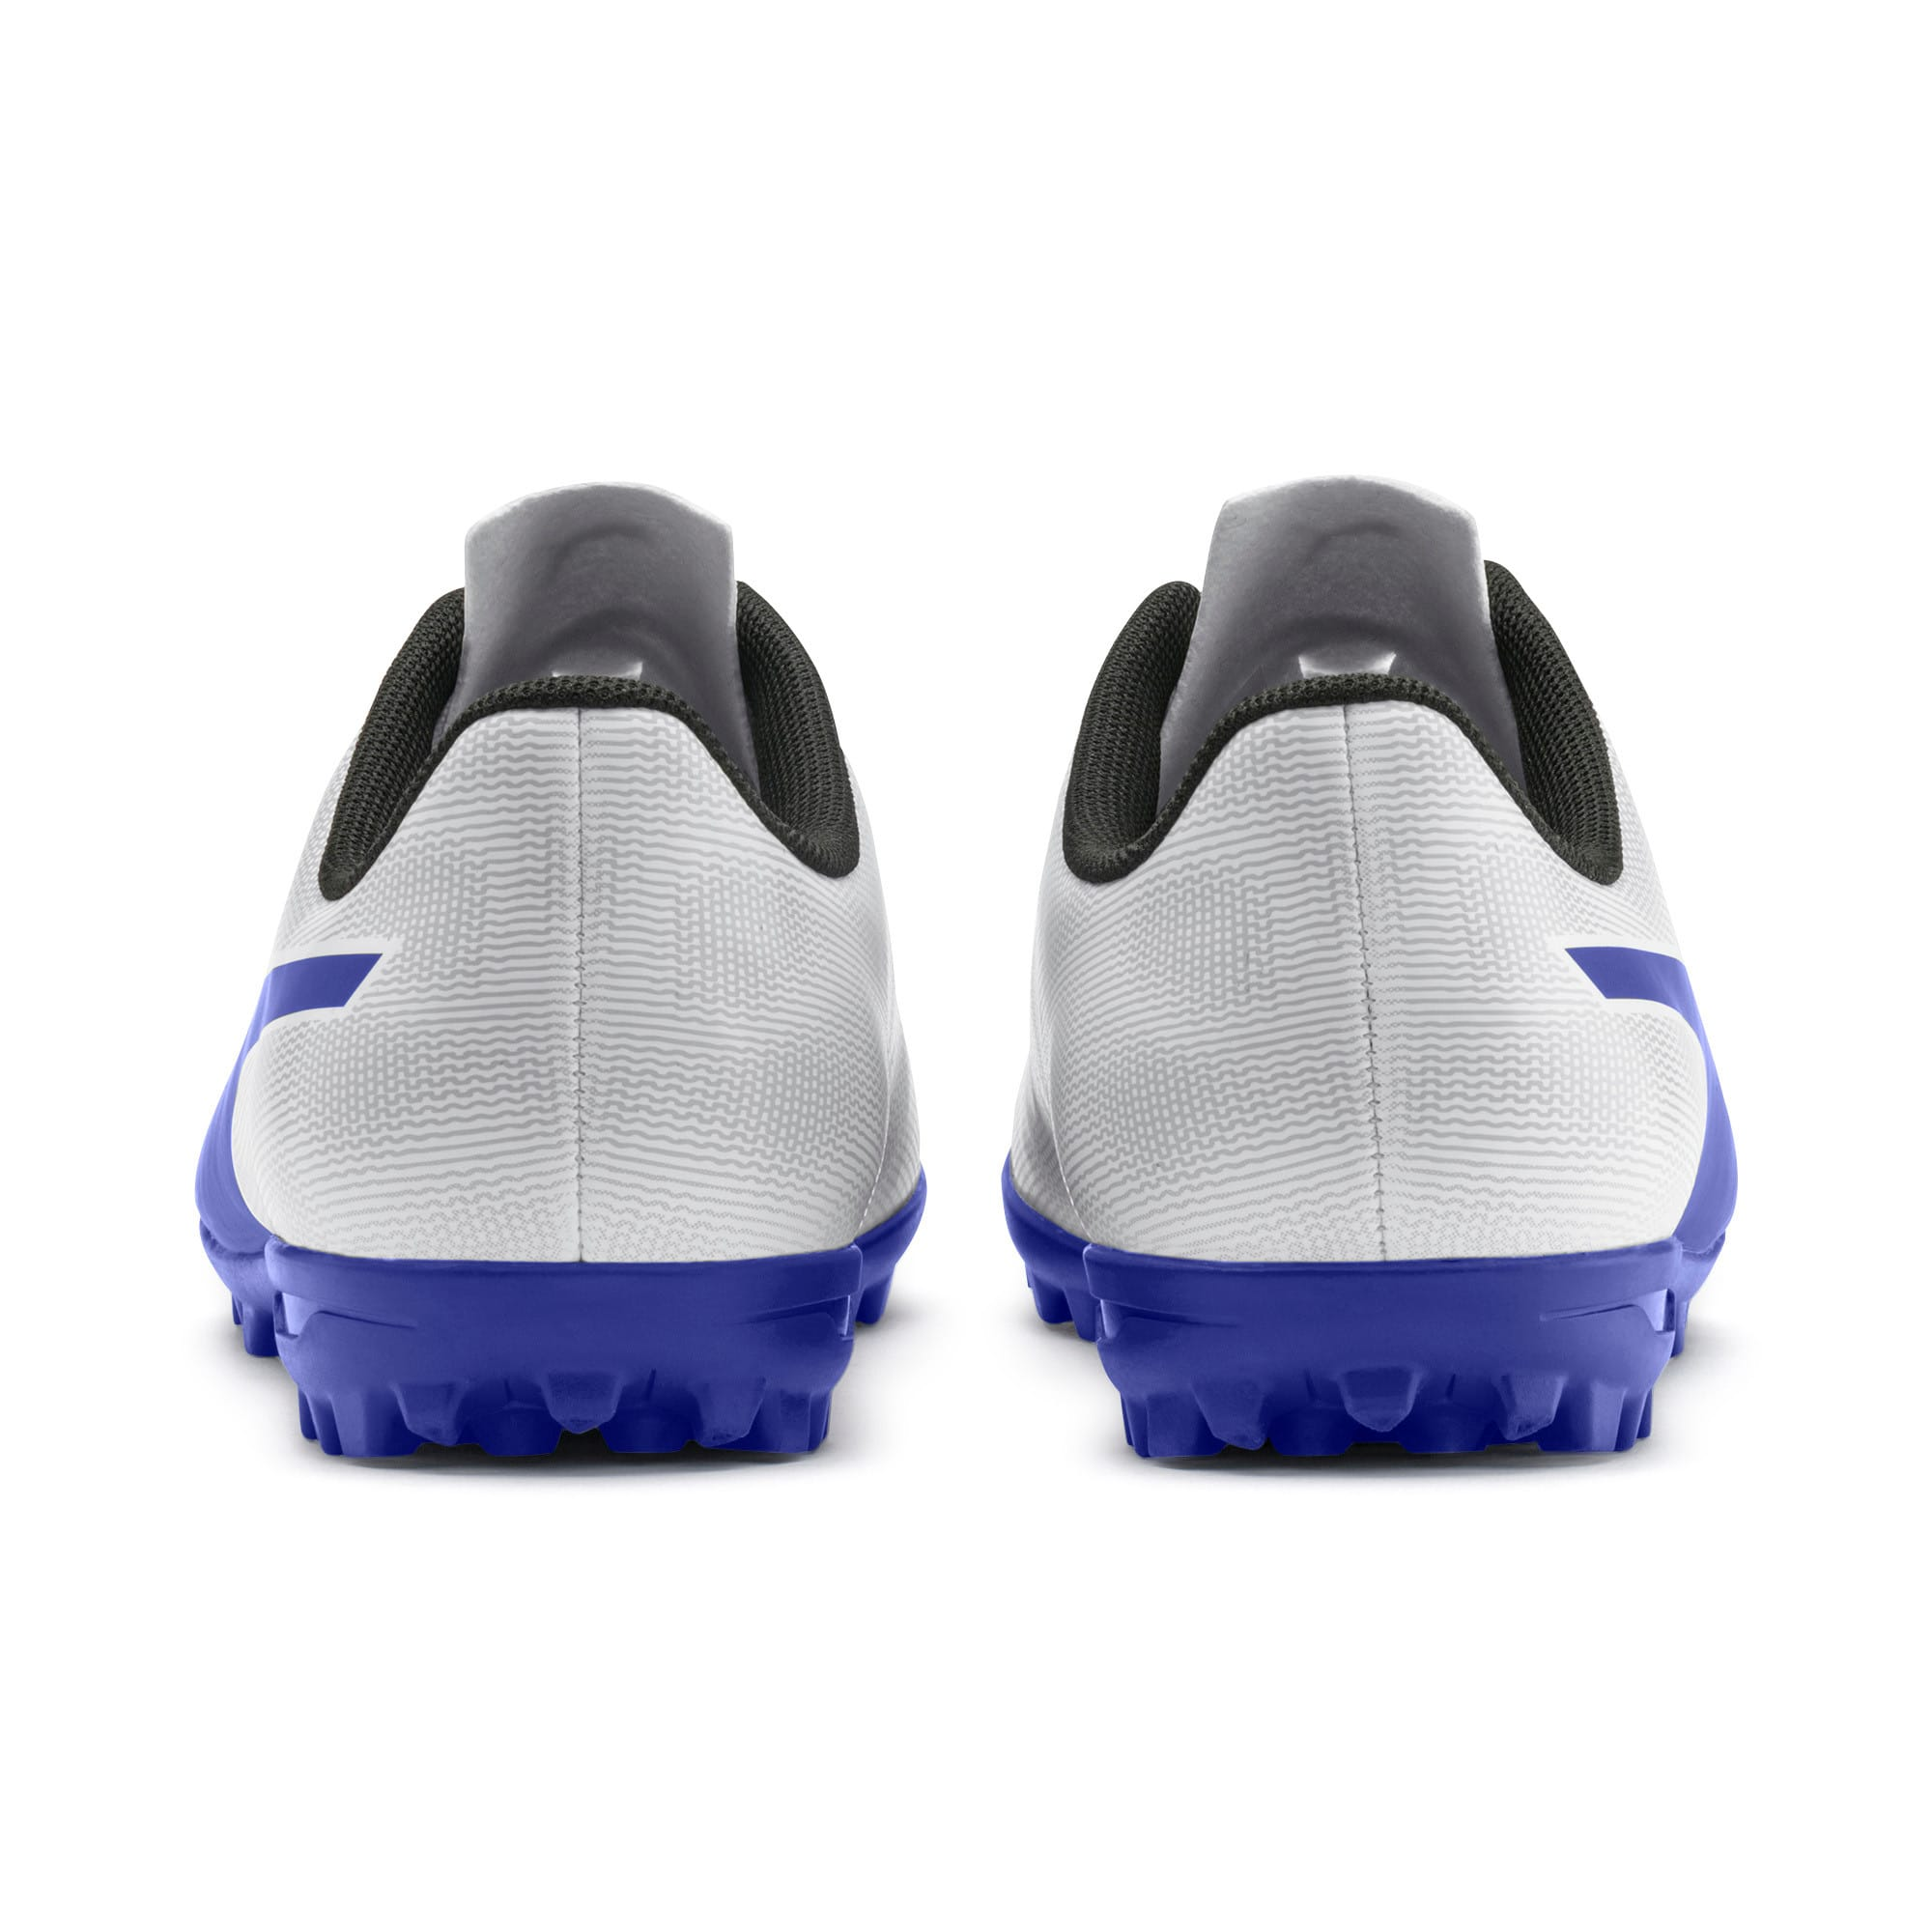 Thumbnail 3 of Rapido TT Boy's Soccer Cleats JR, White-Royal Blue-Light Gray, medium